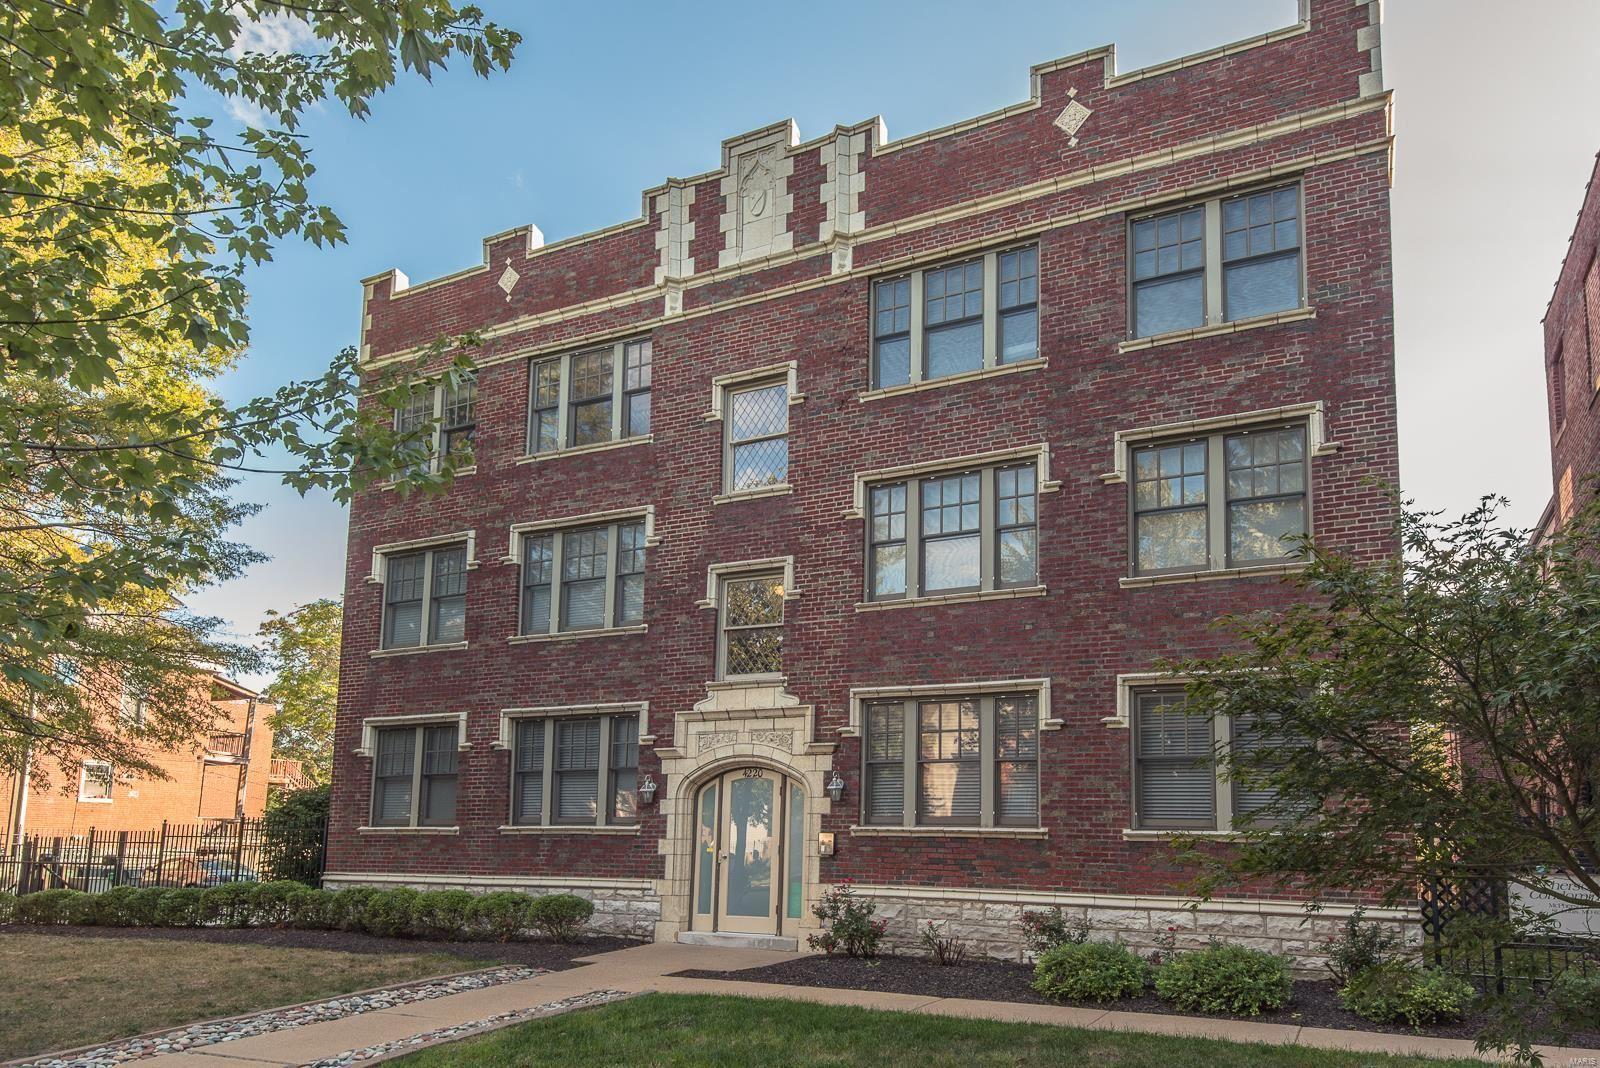 Photo for 4220 Mcpherson Avenue, St Louis, MO 63108 (MLS # 21051035)